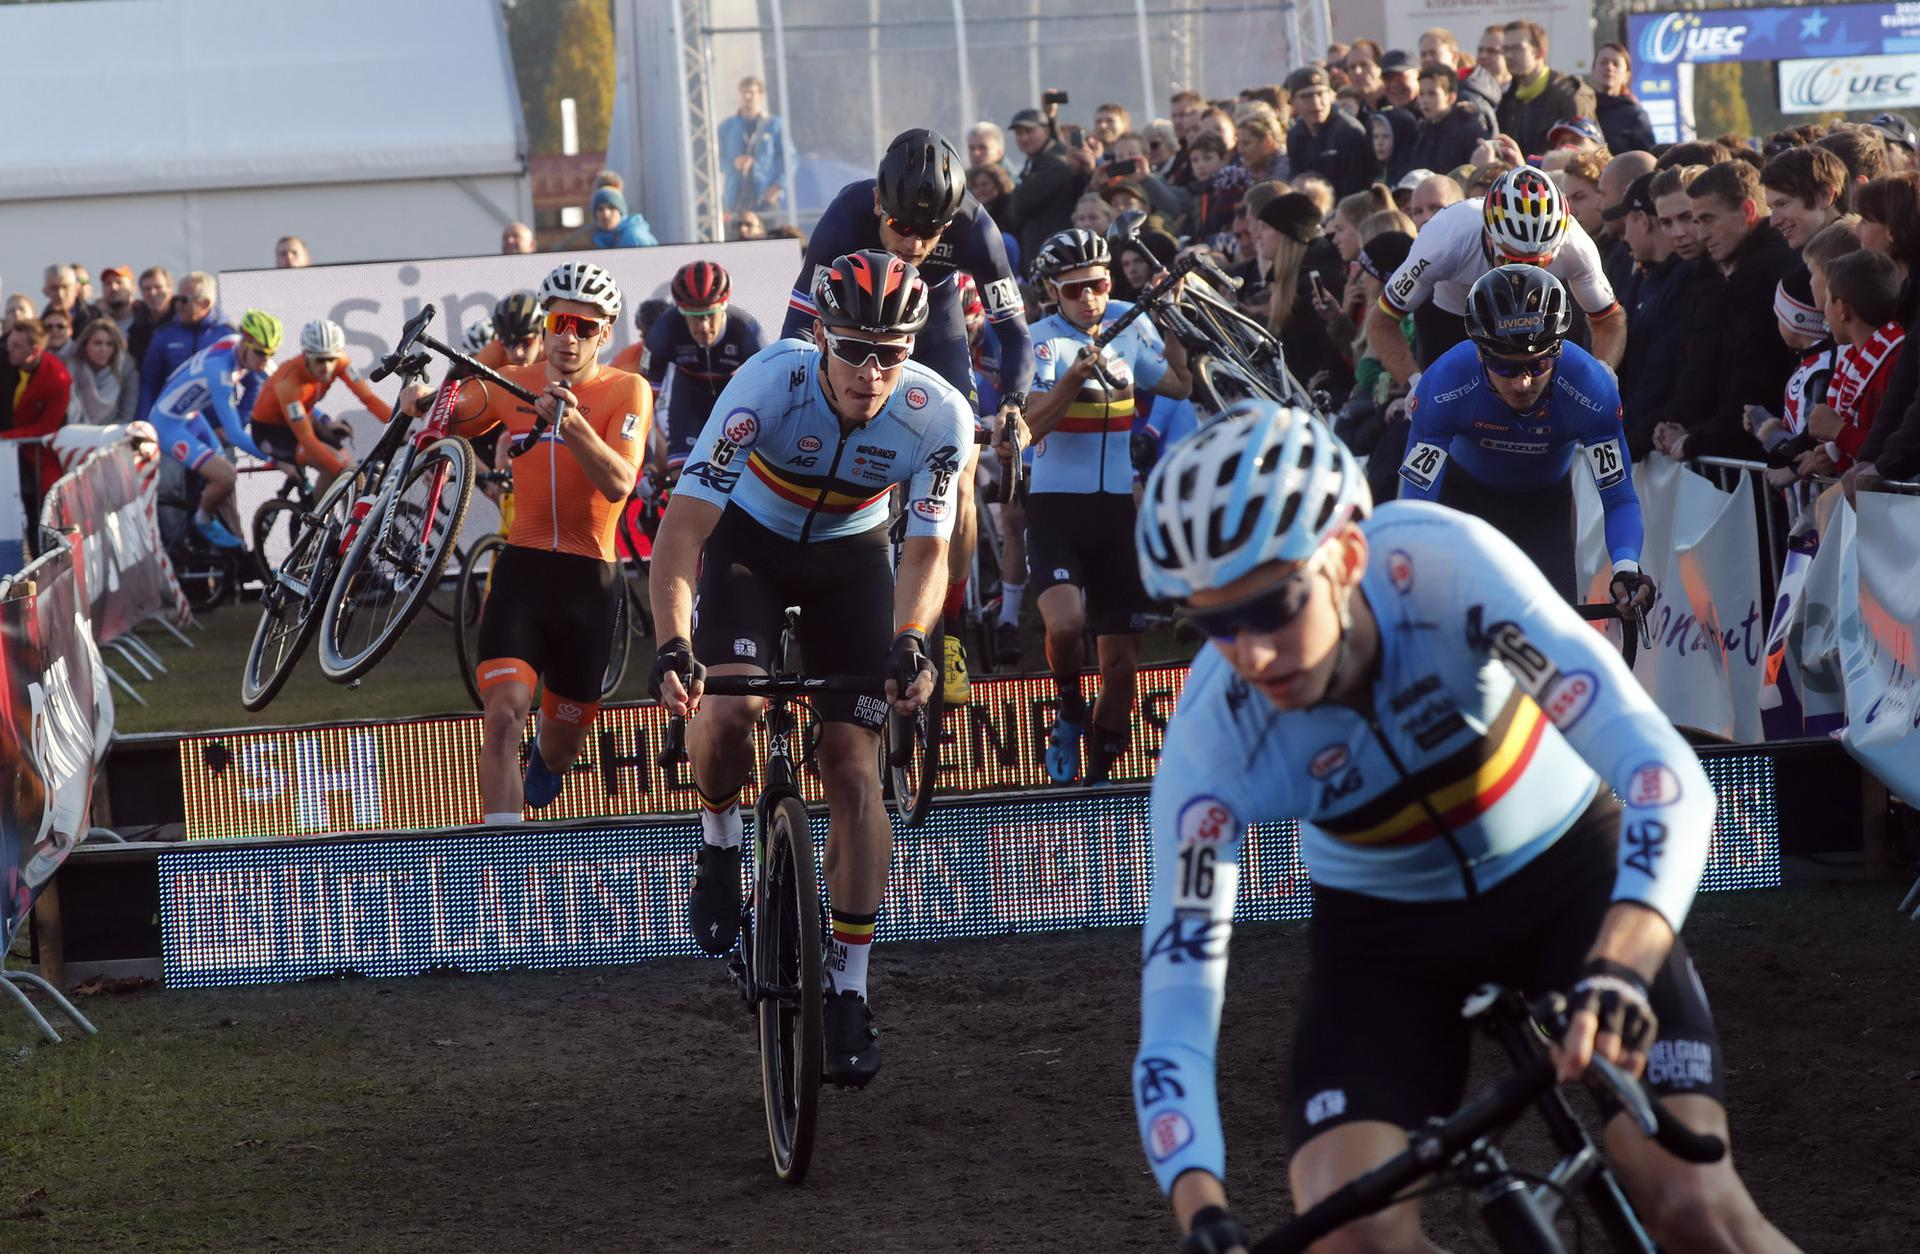 European Cyclo-cross Championships